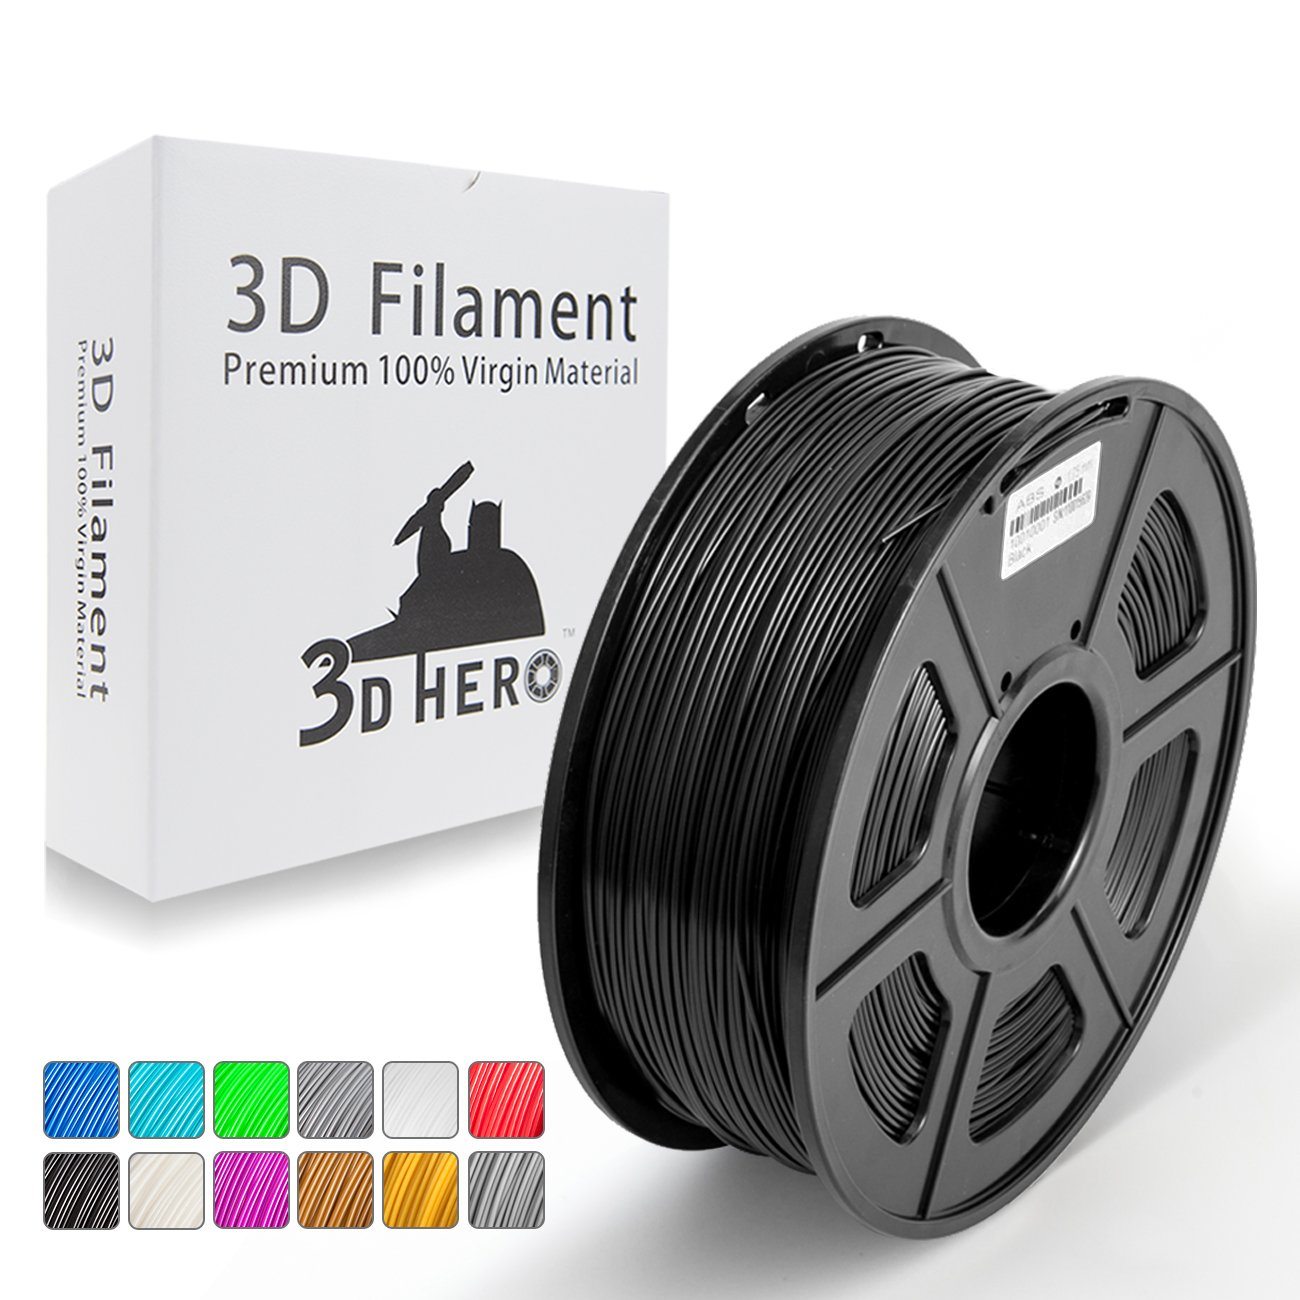 Solid Black ABS 3D Printer Filament 1.75 mm 1kg Spool (2.2lbs), Dimensional Accuracy +/- 0.02 mm Black,NO Clogging